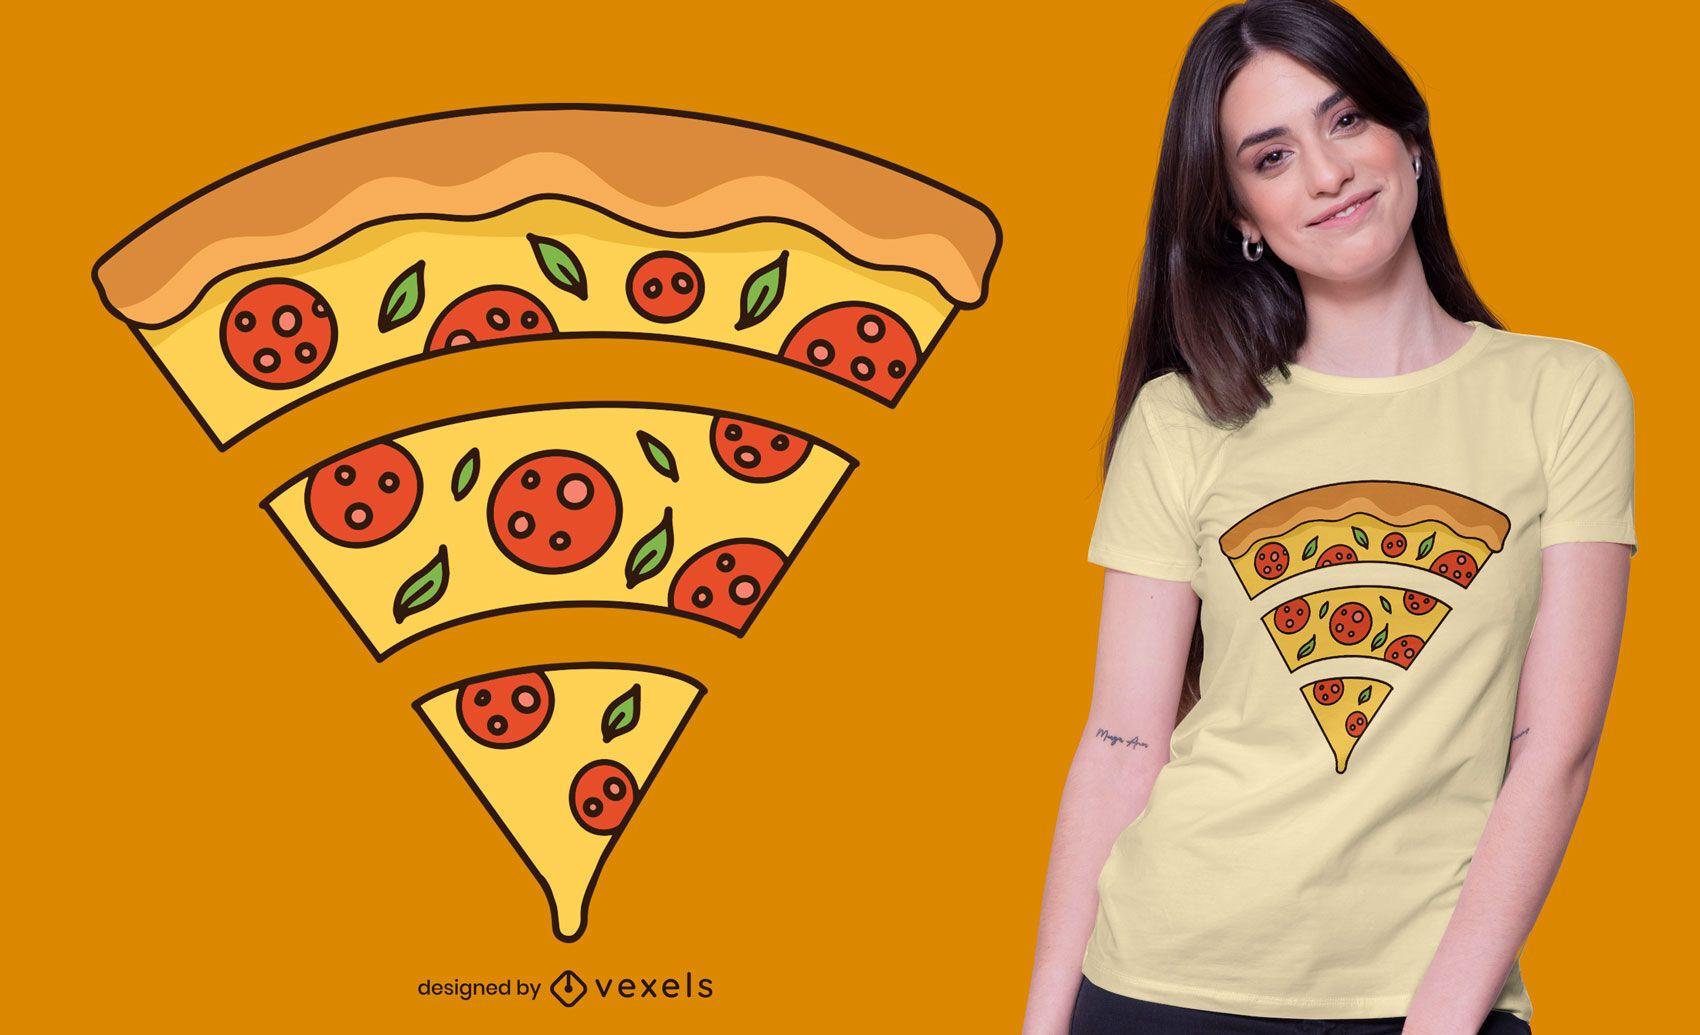 Wifi pizza t-shirt design